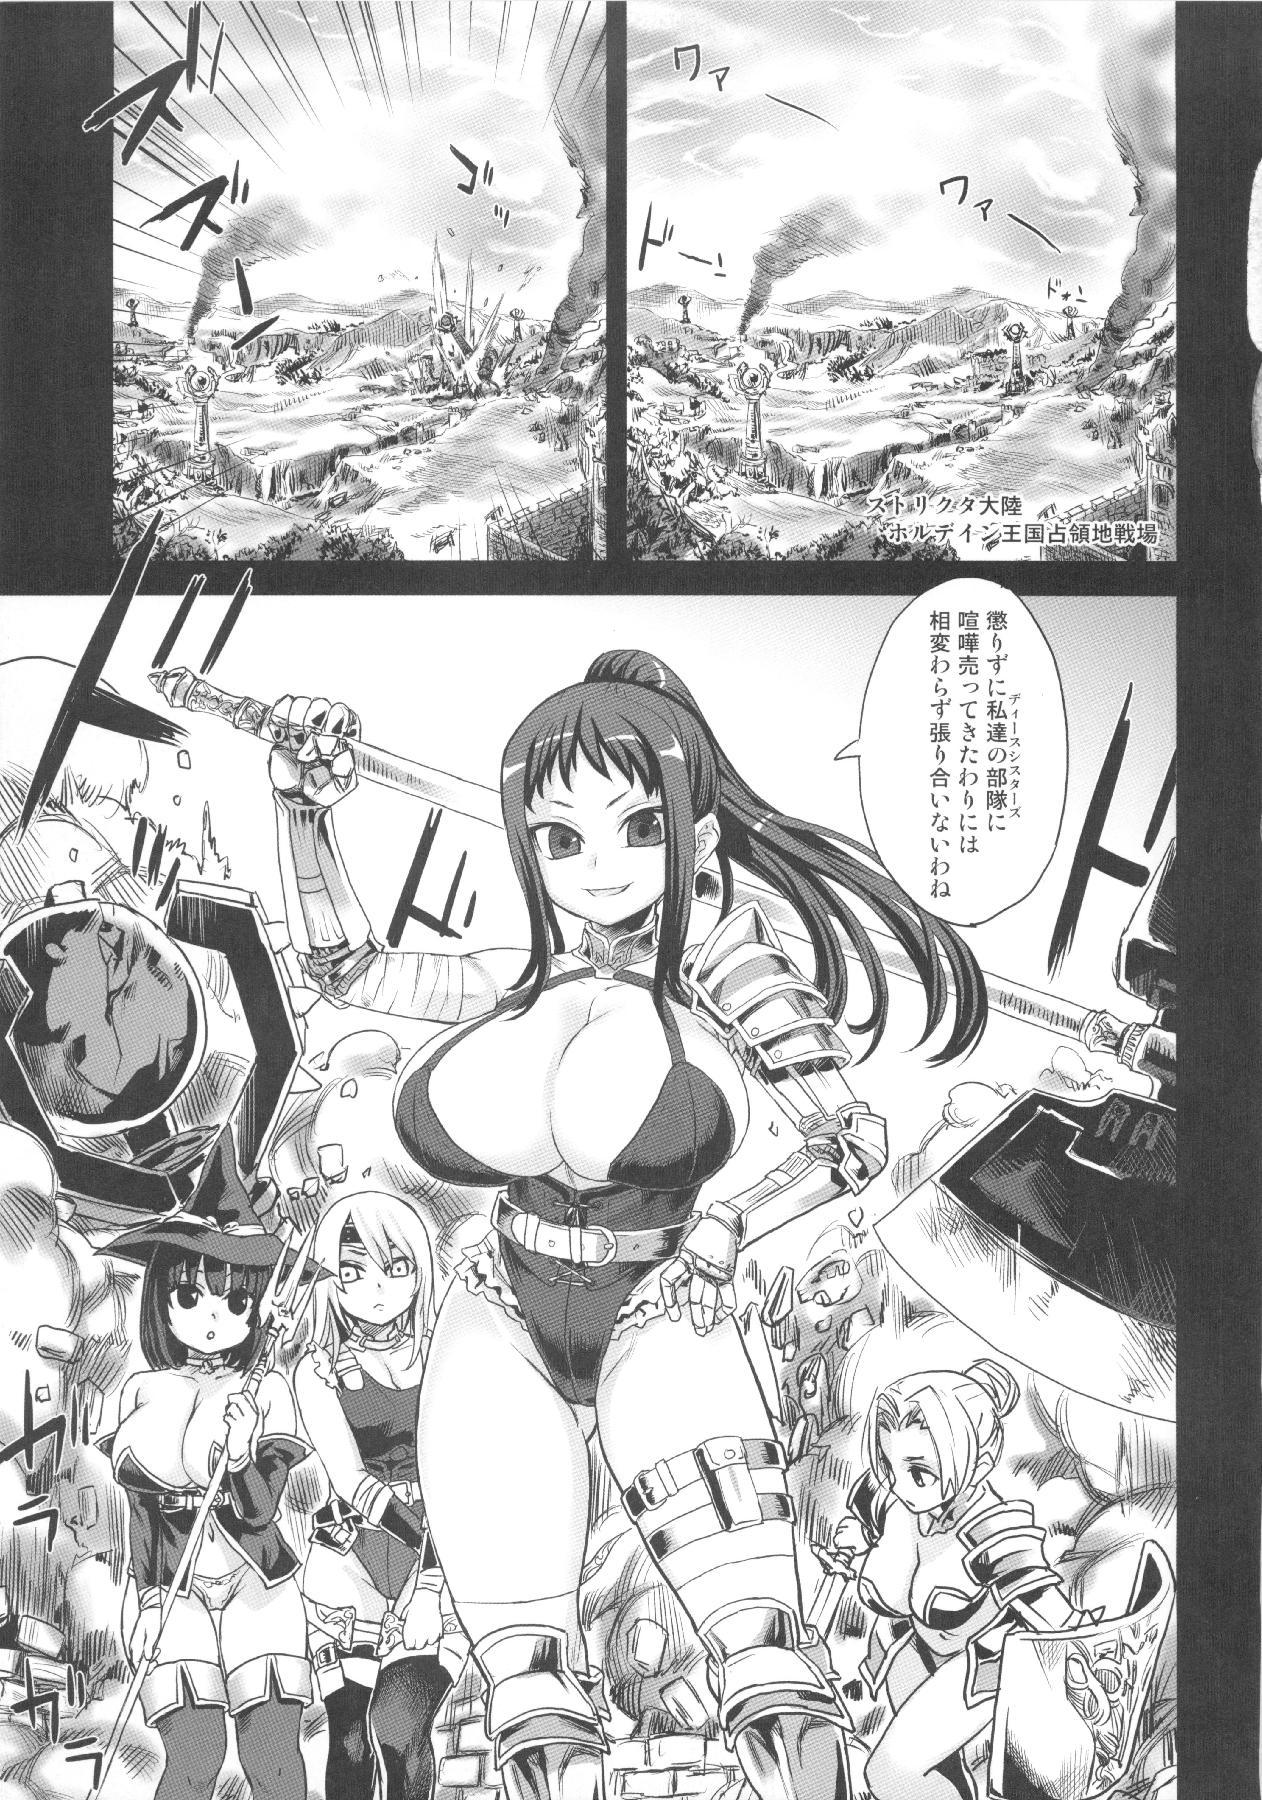 (C83) [Fatalpulse (Asanagi)] VictimGirls Compiled Vol.1 -Victimgirls Soushuuhen 1- MMO Game Selection (Various) 115